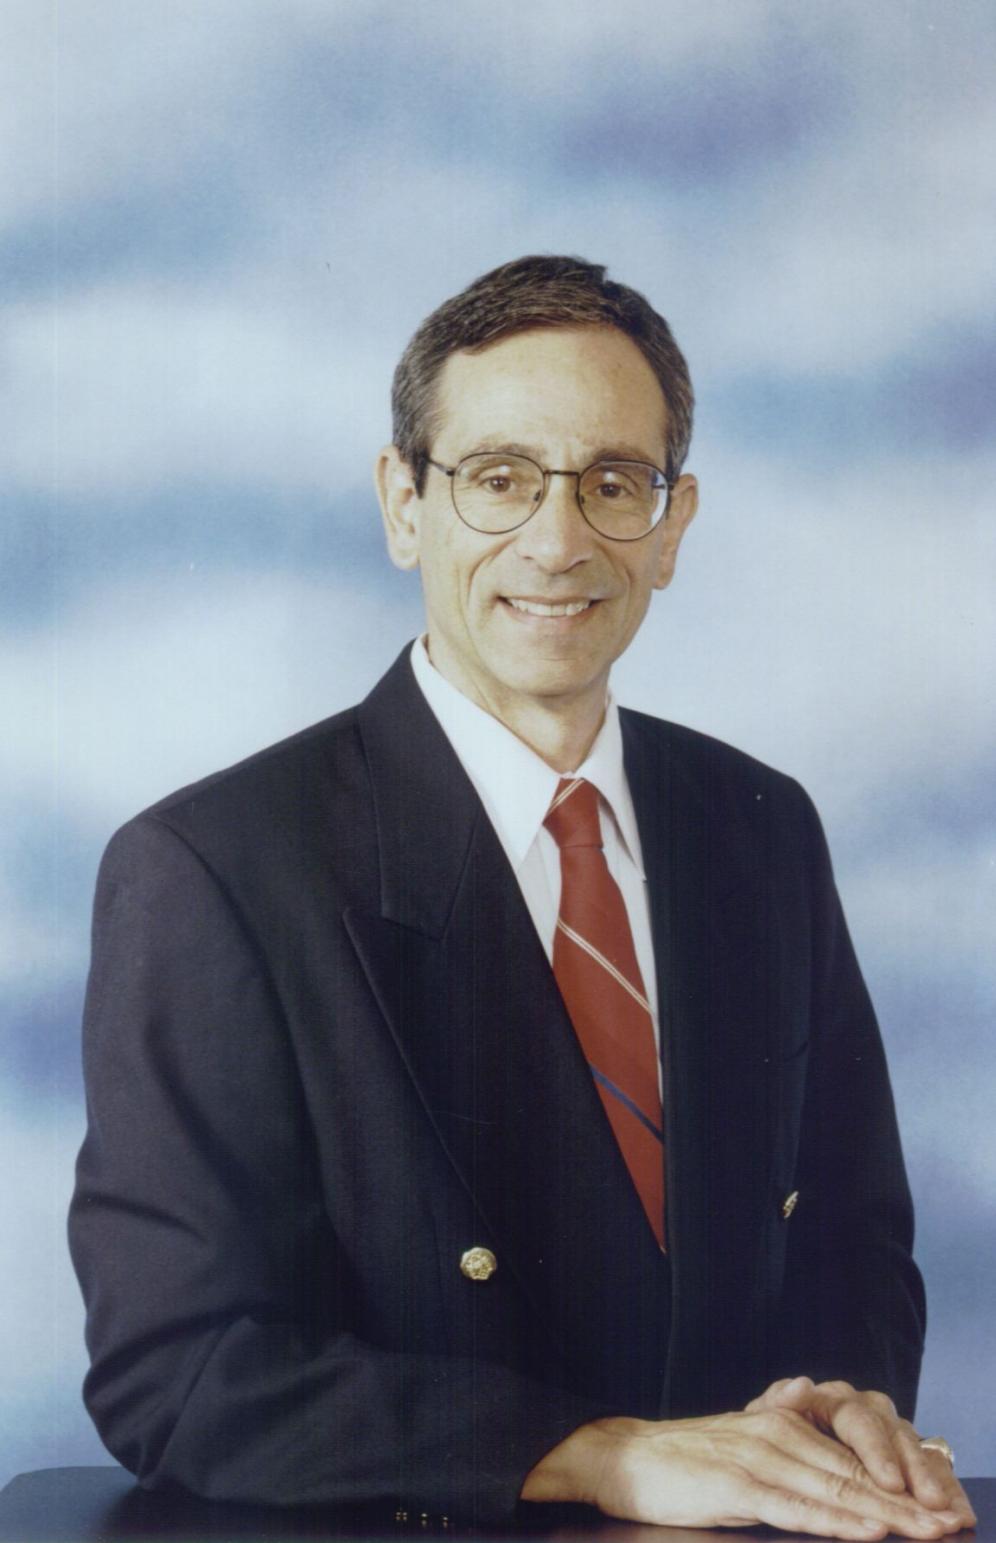 Robert Barrows, adman, author, poet, songwriter, sculptor and inventor